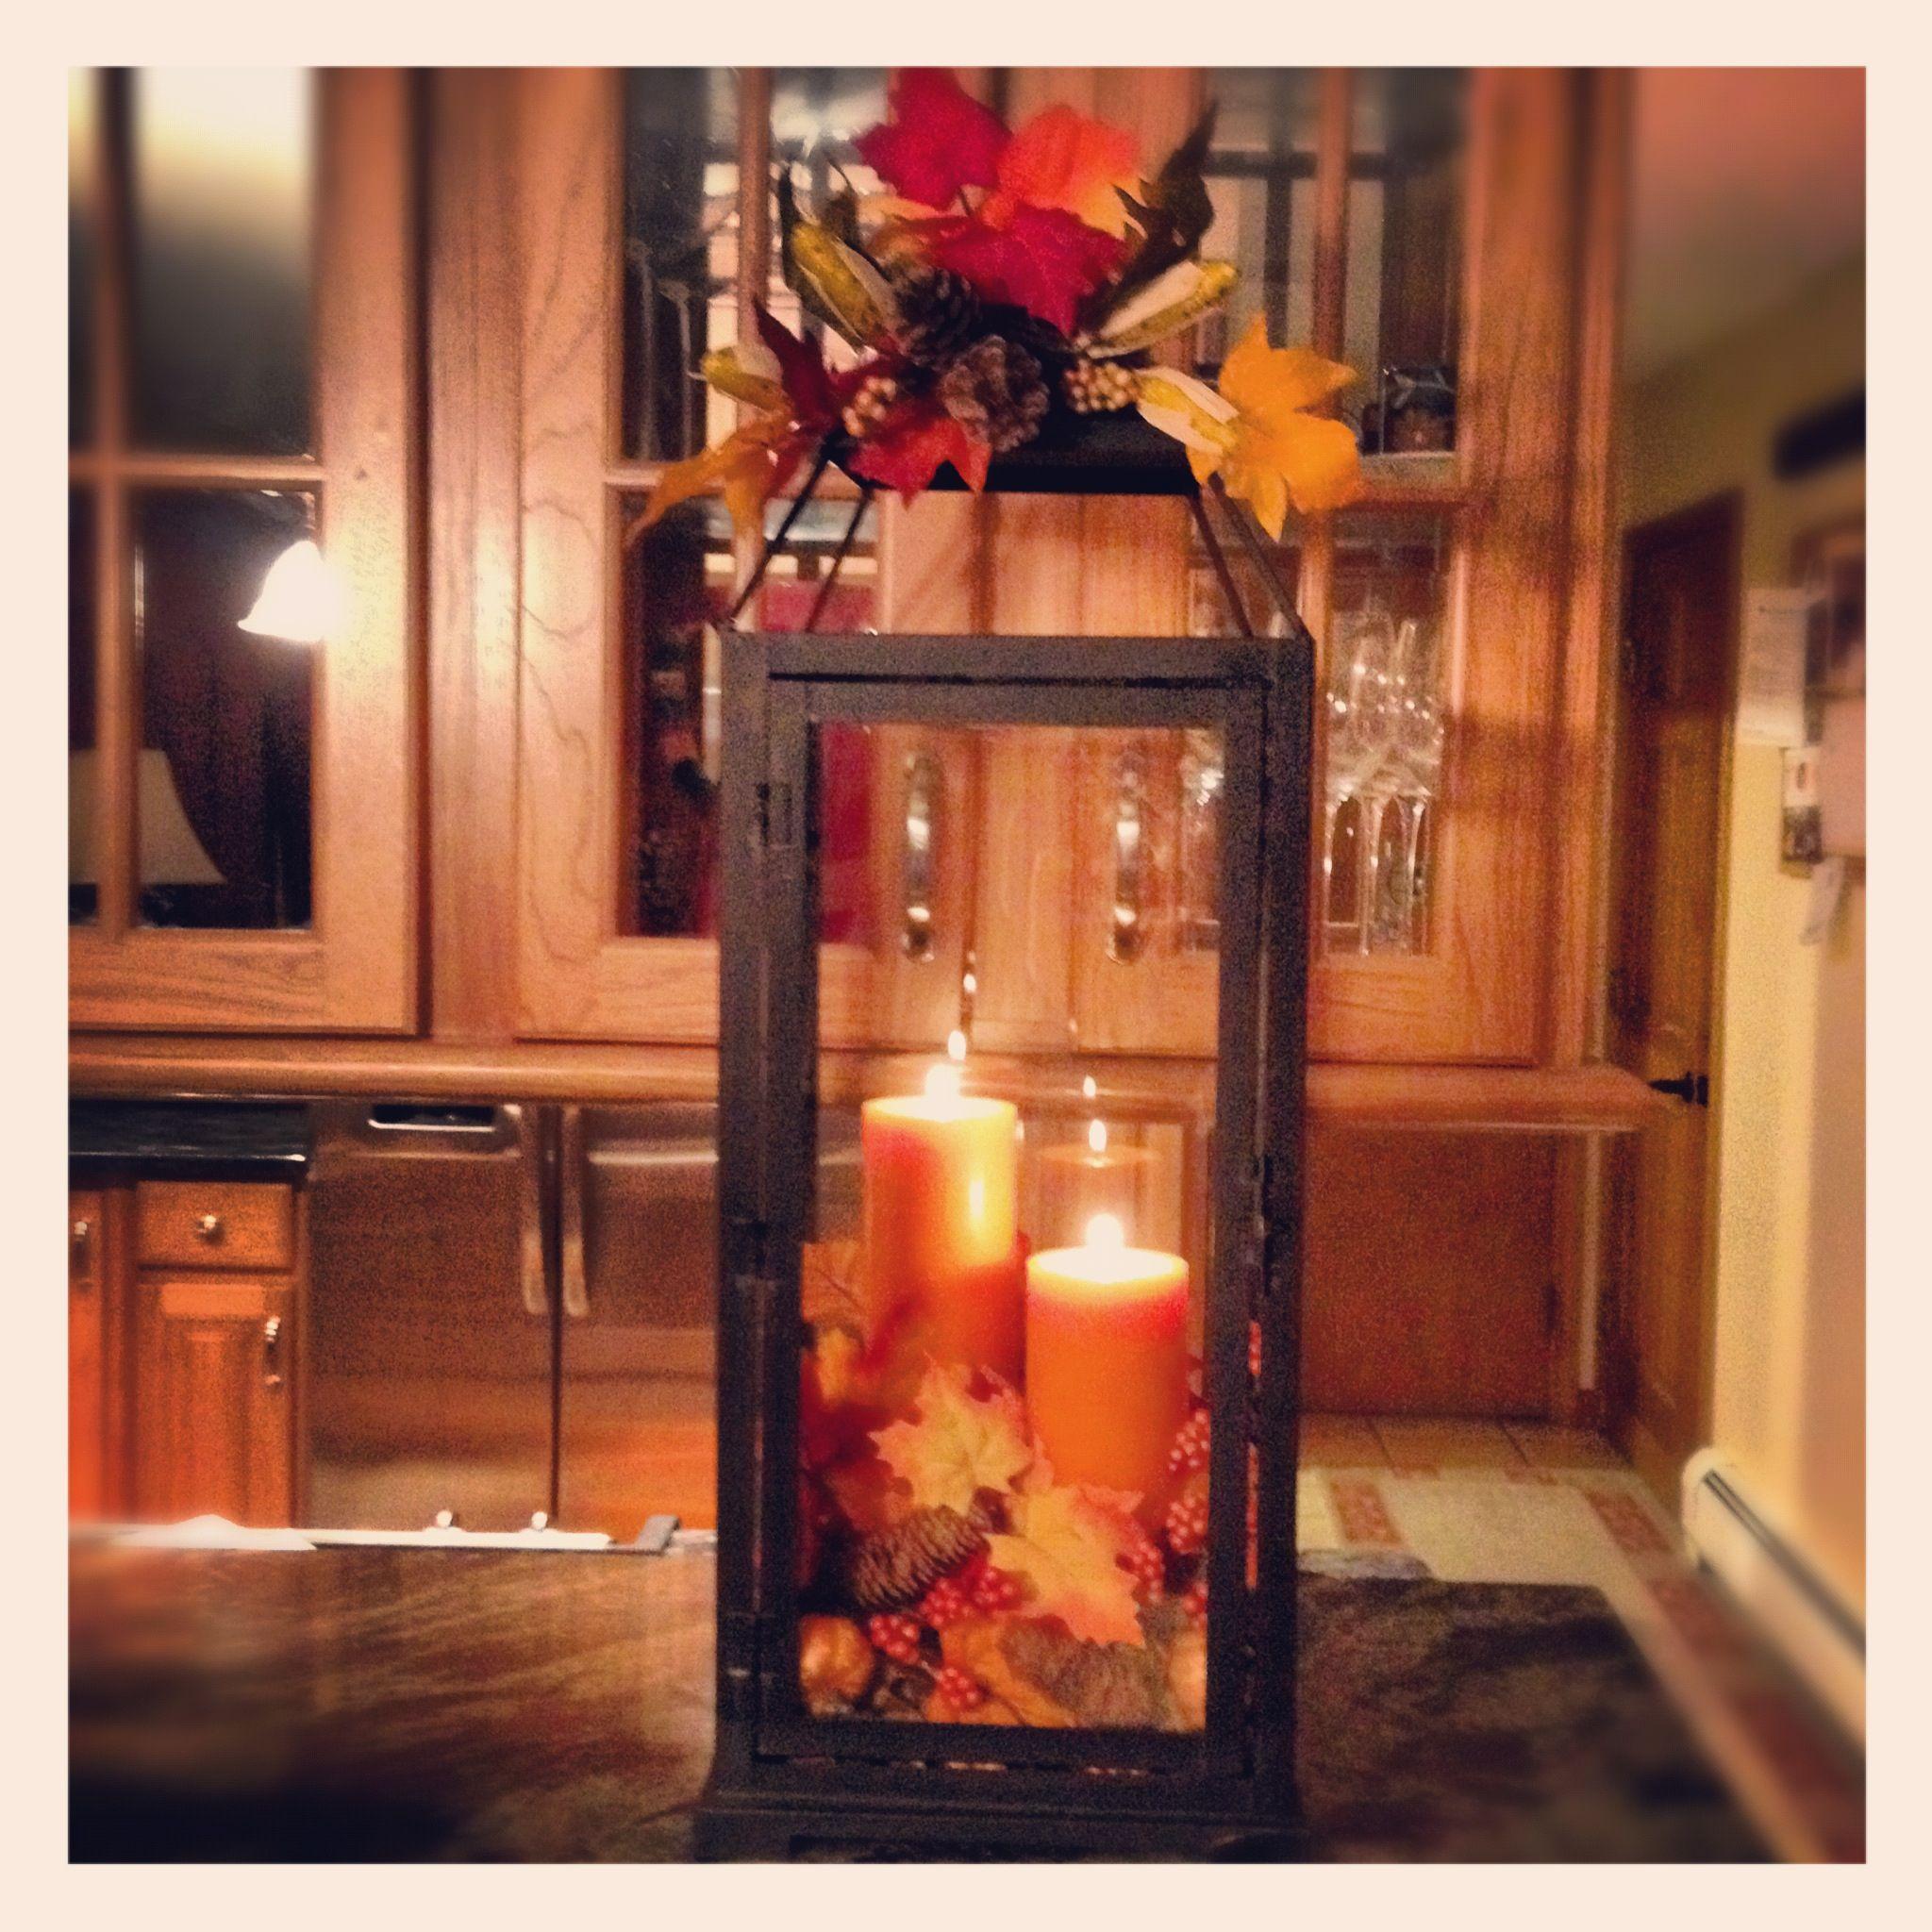 Fall Decor Ideas Good Idea For Kitchen Table Centerpiece Maybe